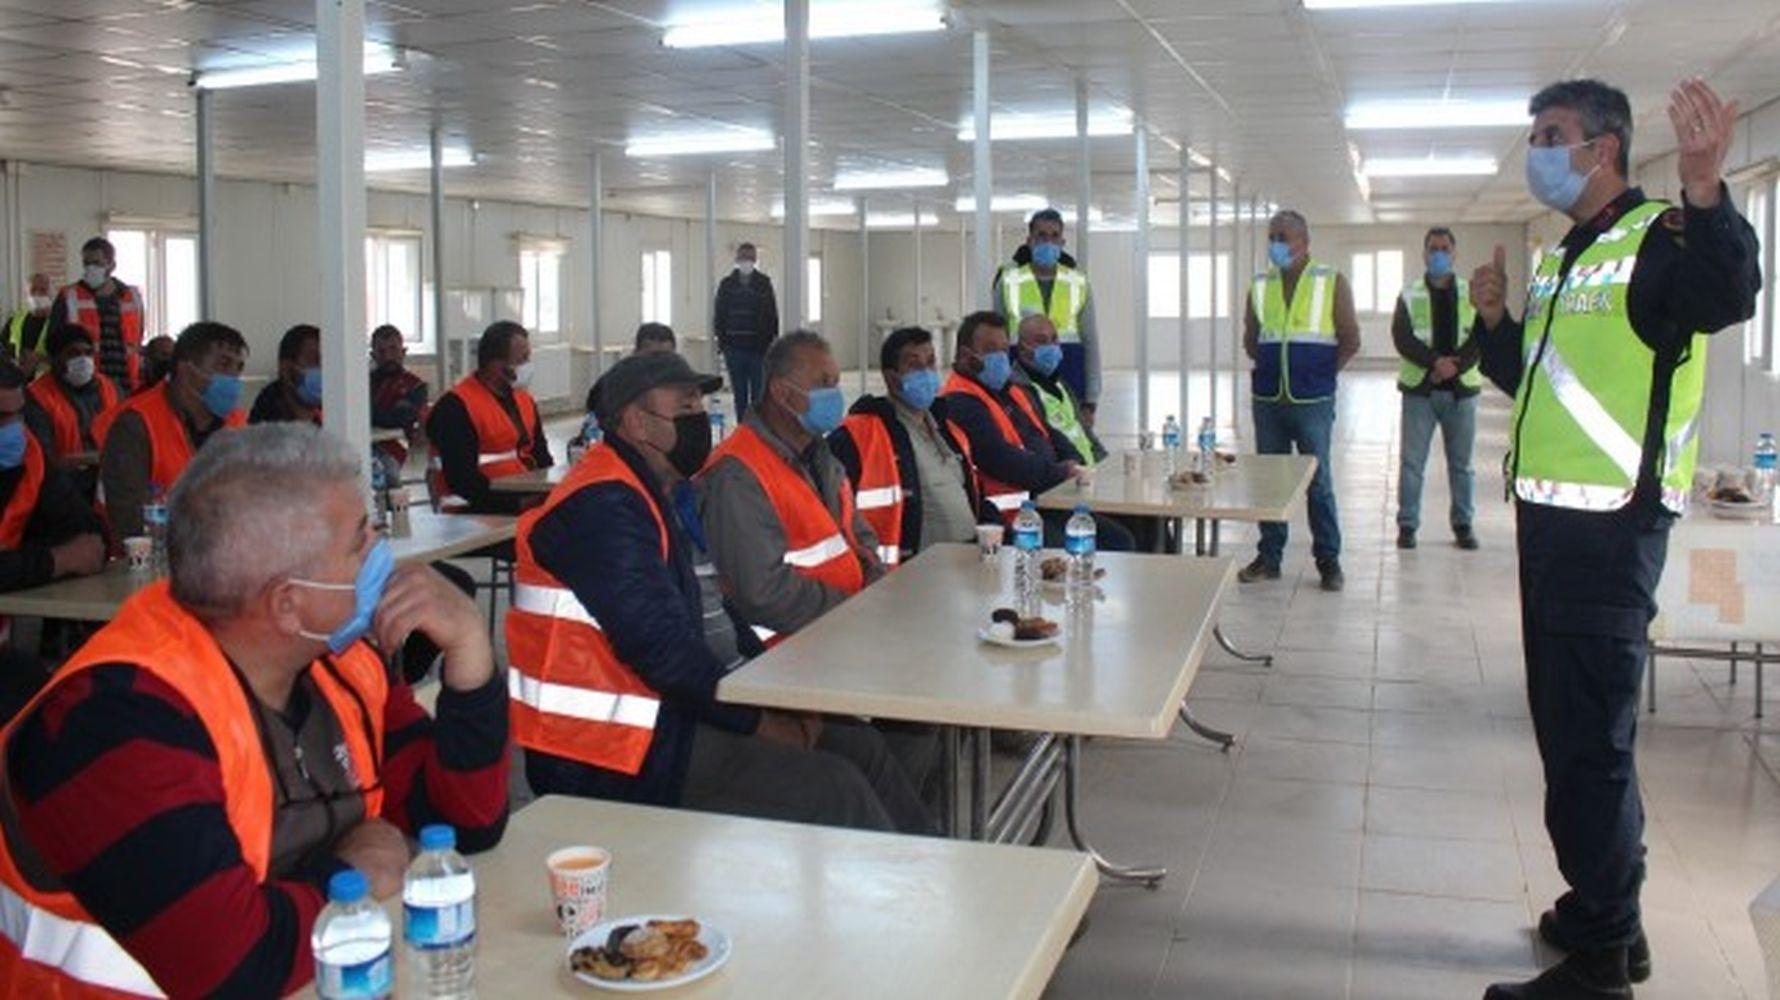 İzmir ankara high speed train construction training for drivers from the gendarmerie